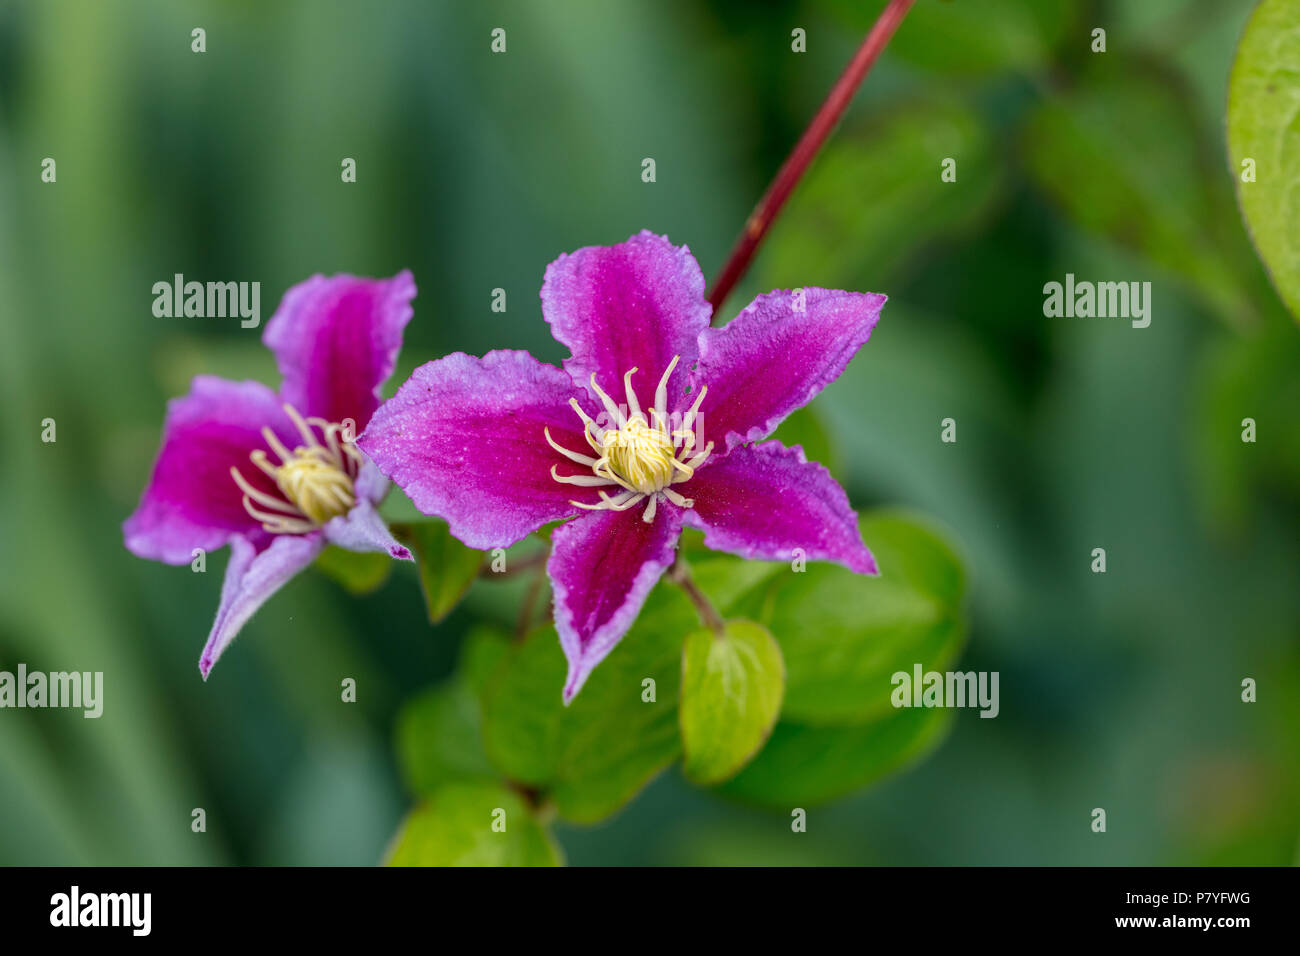 'Piilu' Late large-flowered group, Sena storblommig gruppen (Clematis) - Stock Image